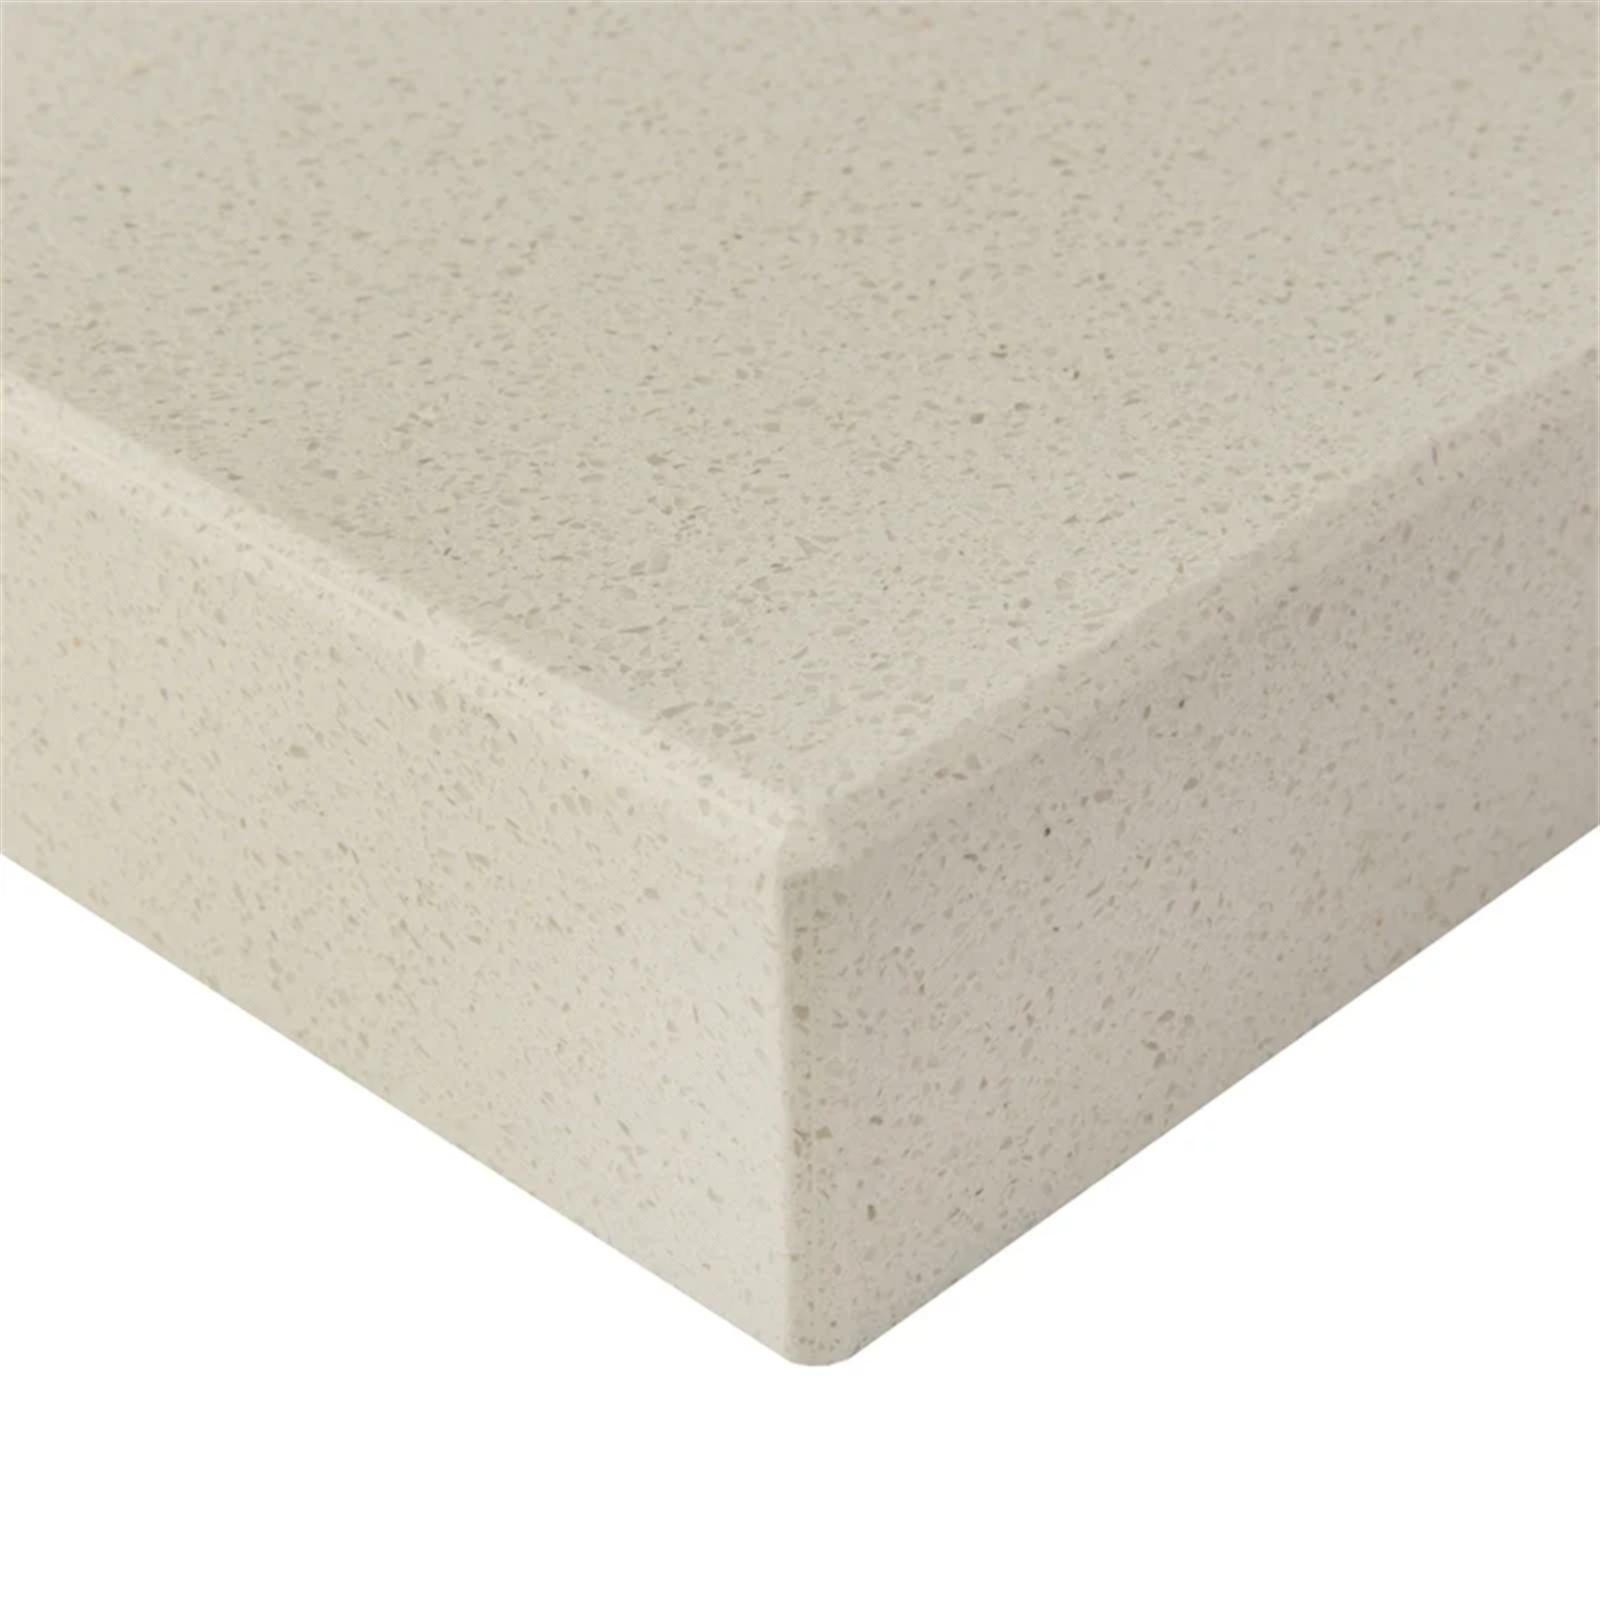 Essential Stone 40mm Square Urbane Stone Benchtop - Creme Caramel